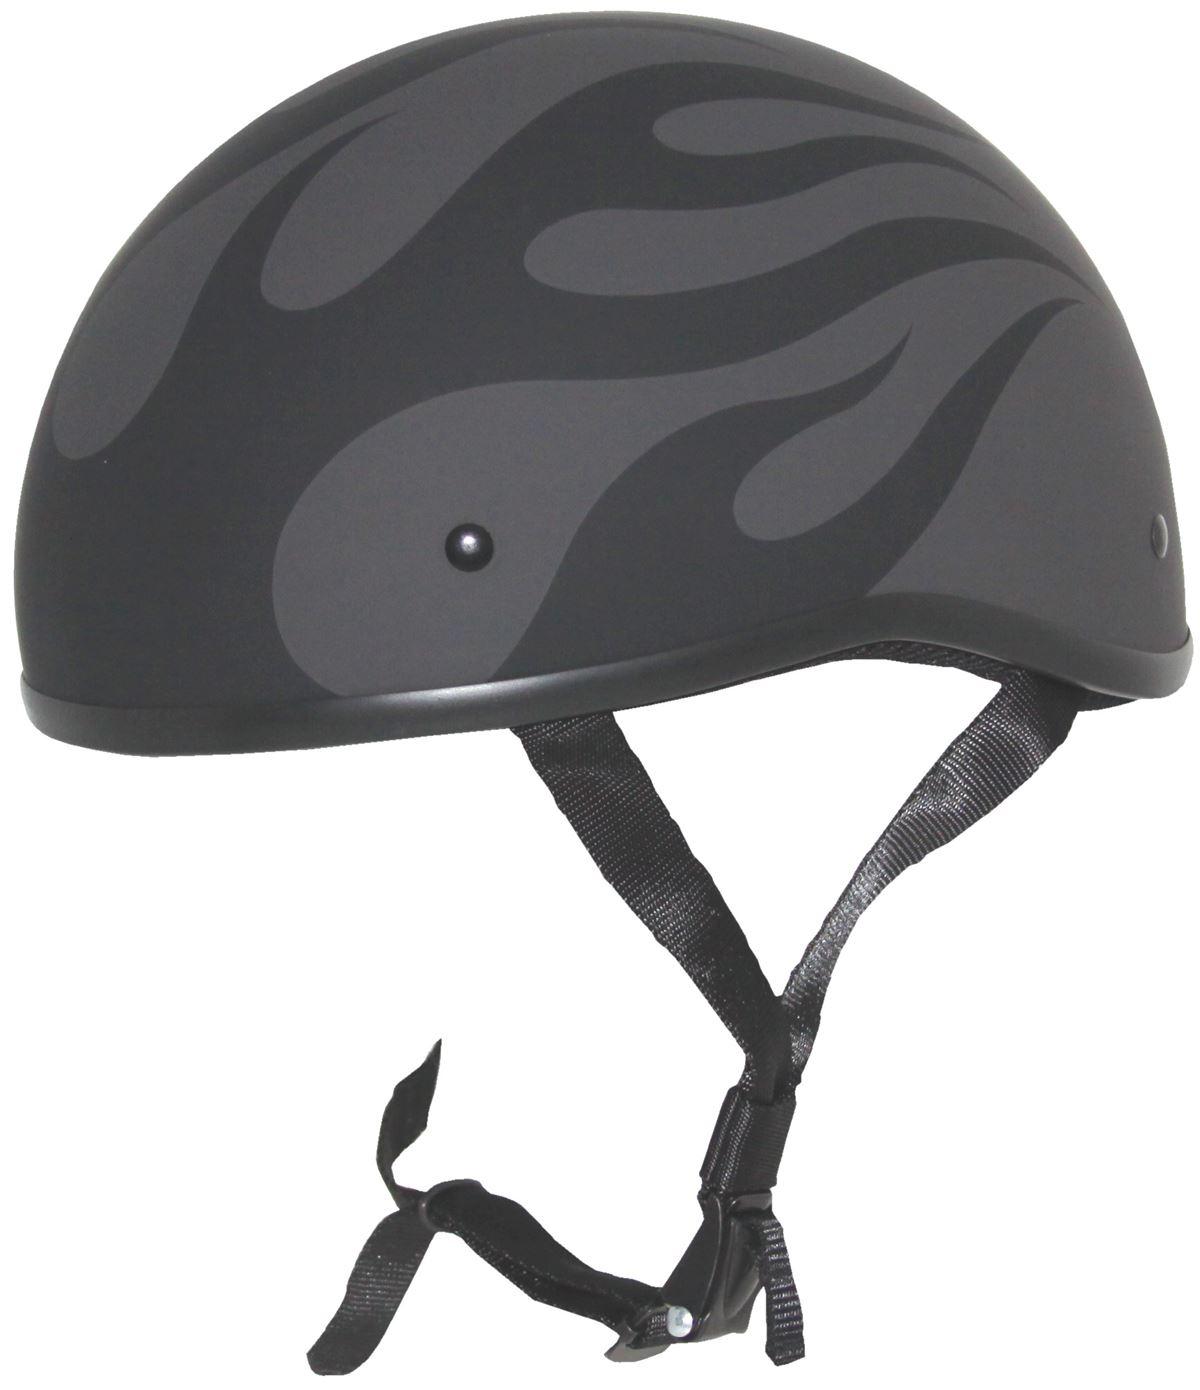 Zox Retro Old School Helmet Half Naked Dot Motorcycle Fiberglass